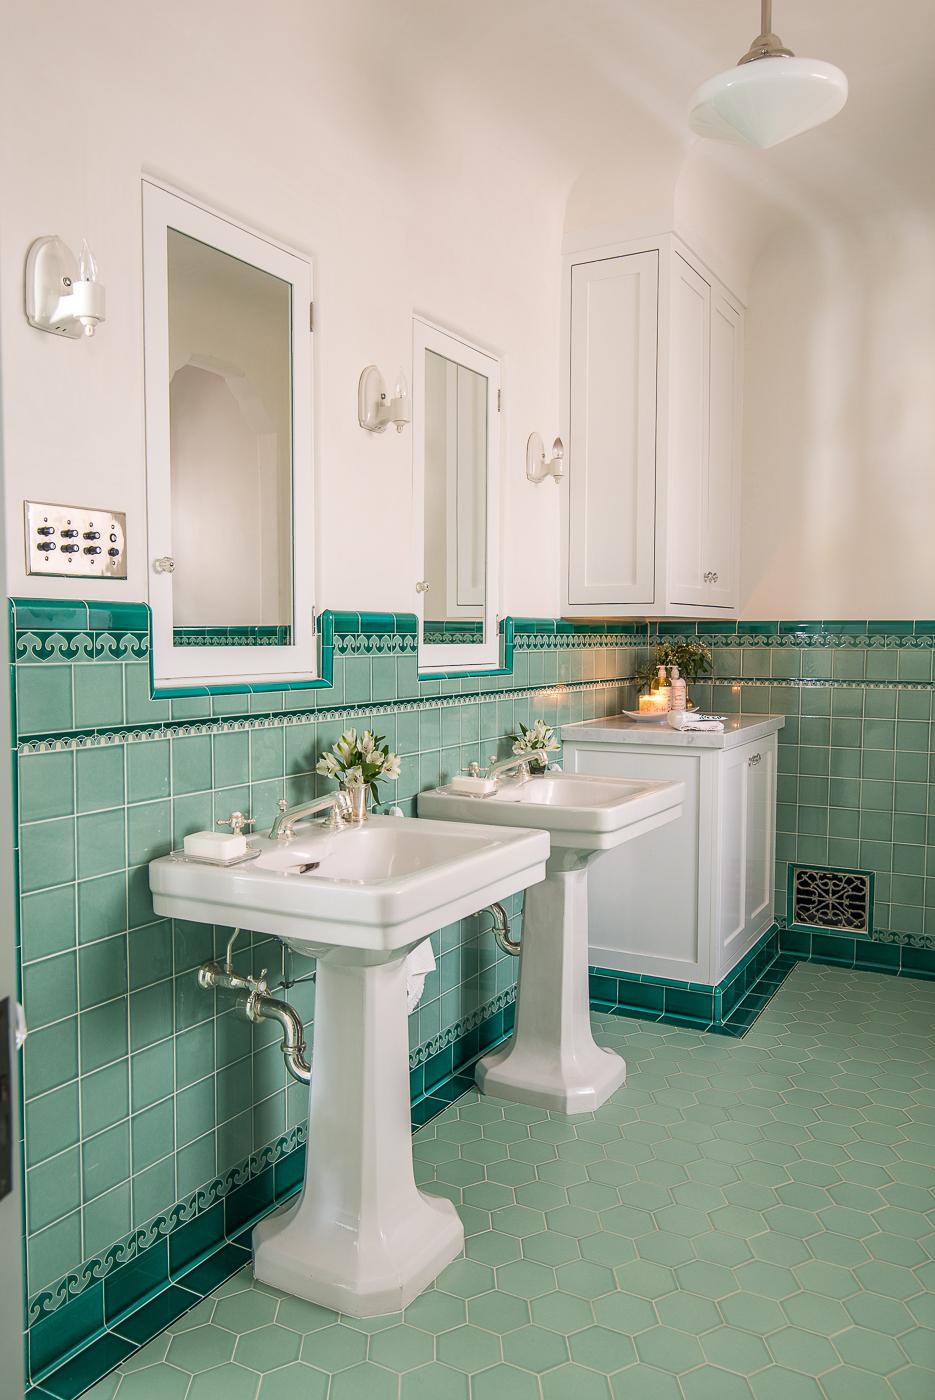 01-edgemont-bath 4.jpg